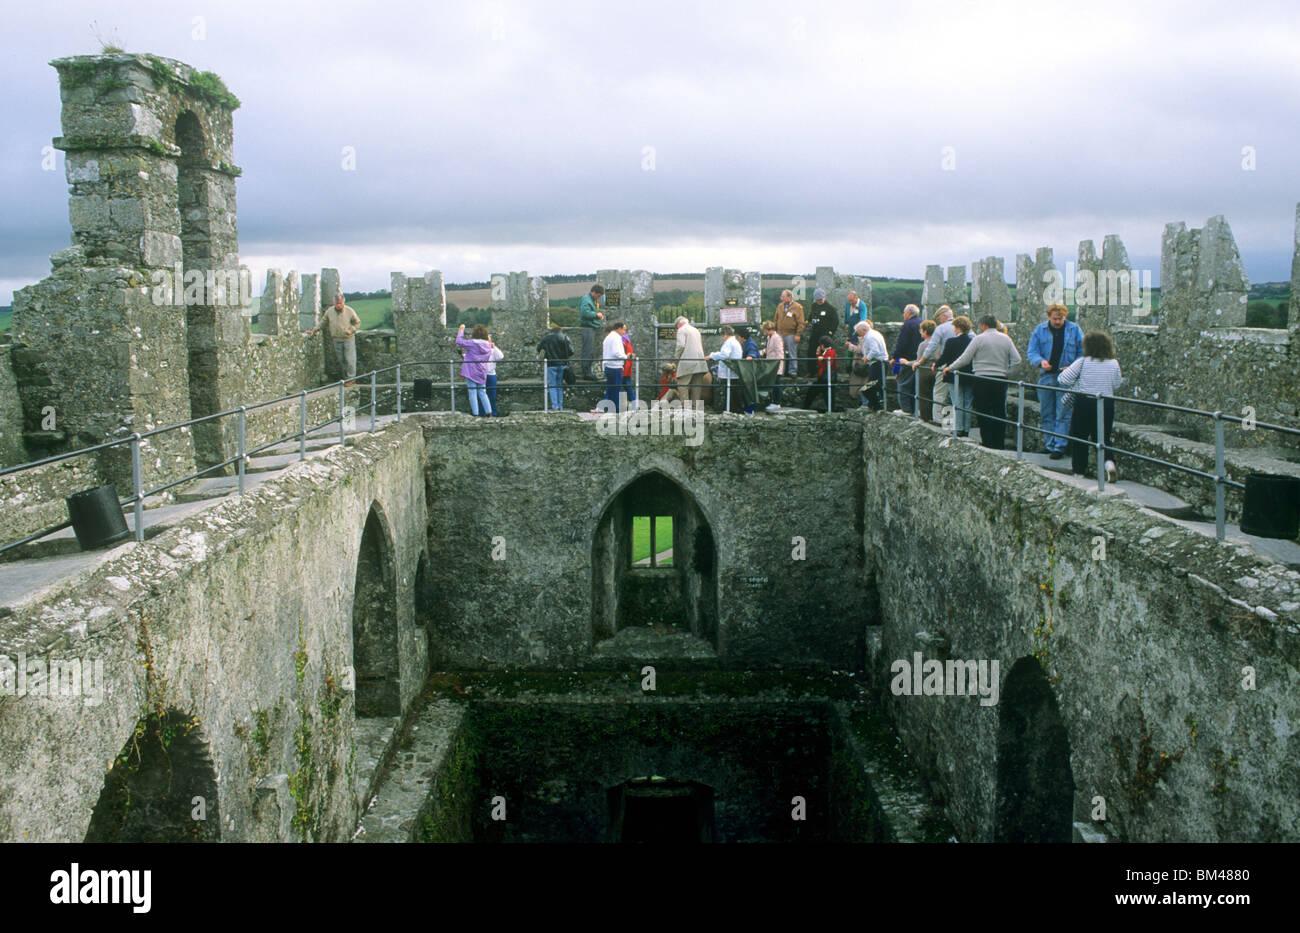 blarney castle county cork tourists waiting to kiss blarney stone ireland eire irish castles